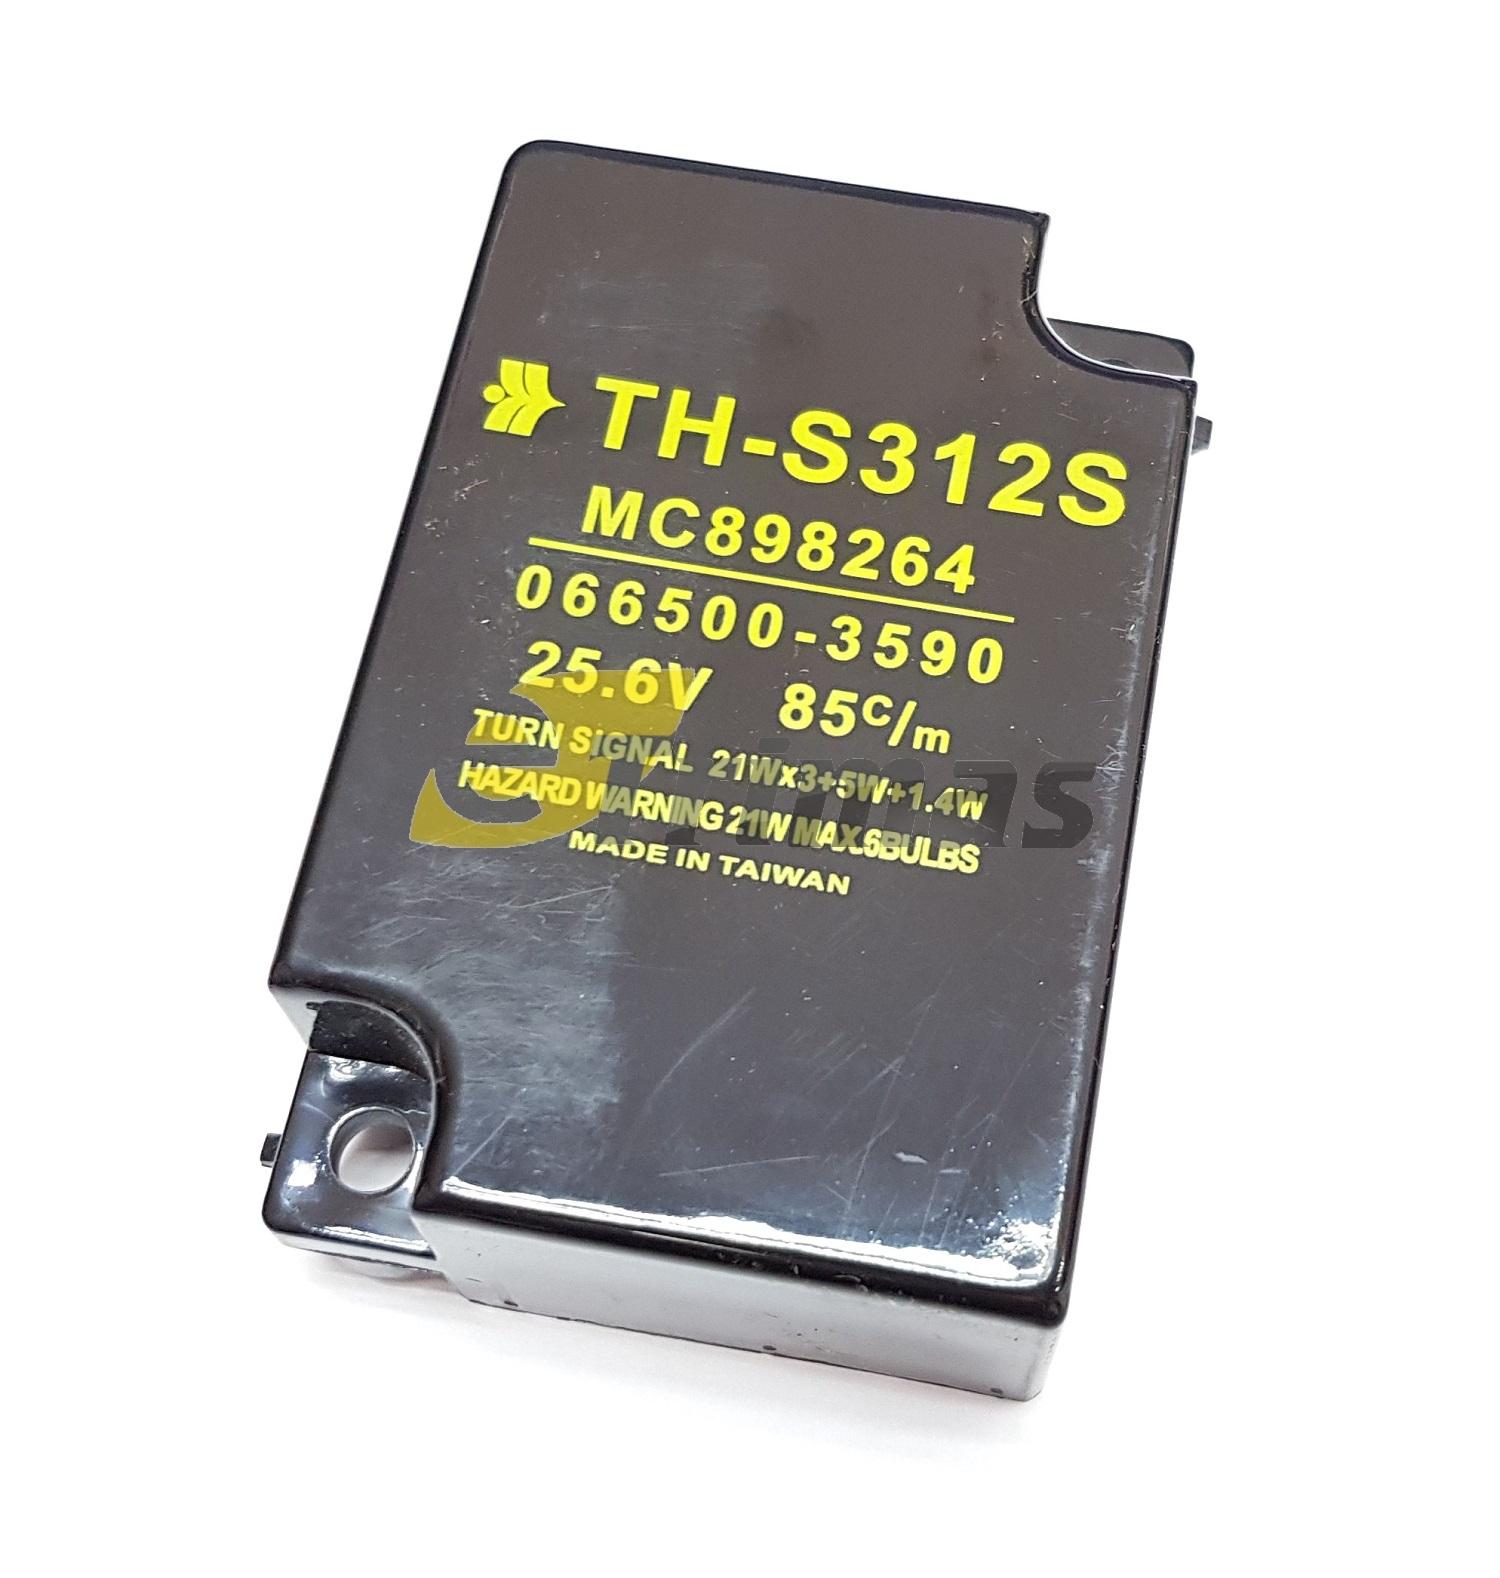 Mc898264 066500 3590 Mc896426 Mitsub End 12 3 2018 736 Pm Terminal Flasher Relay Mitsubishi Canter